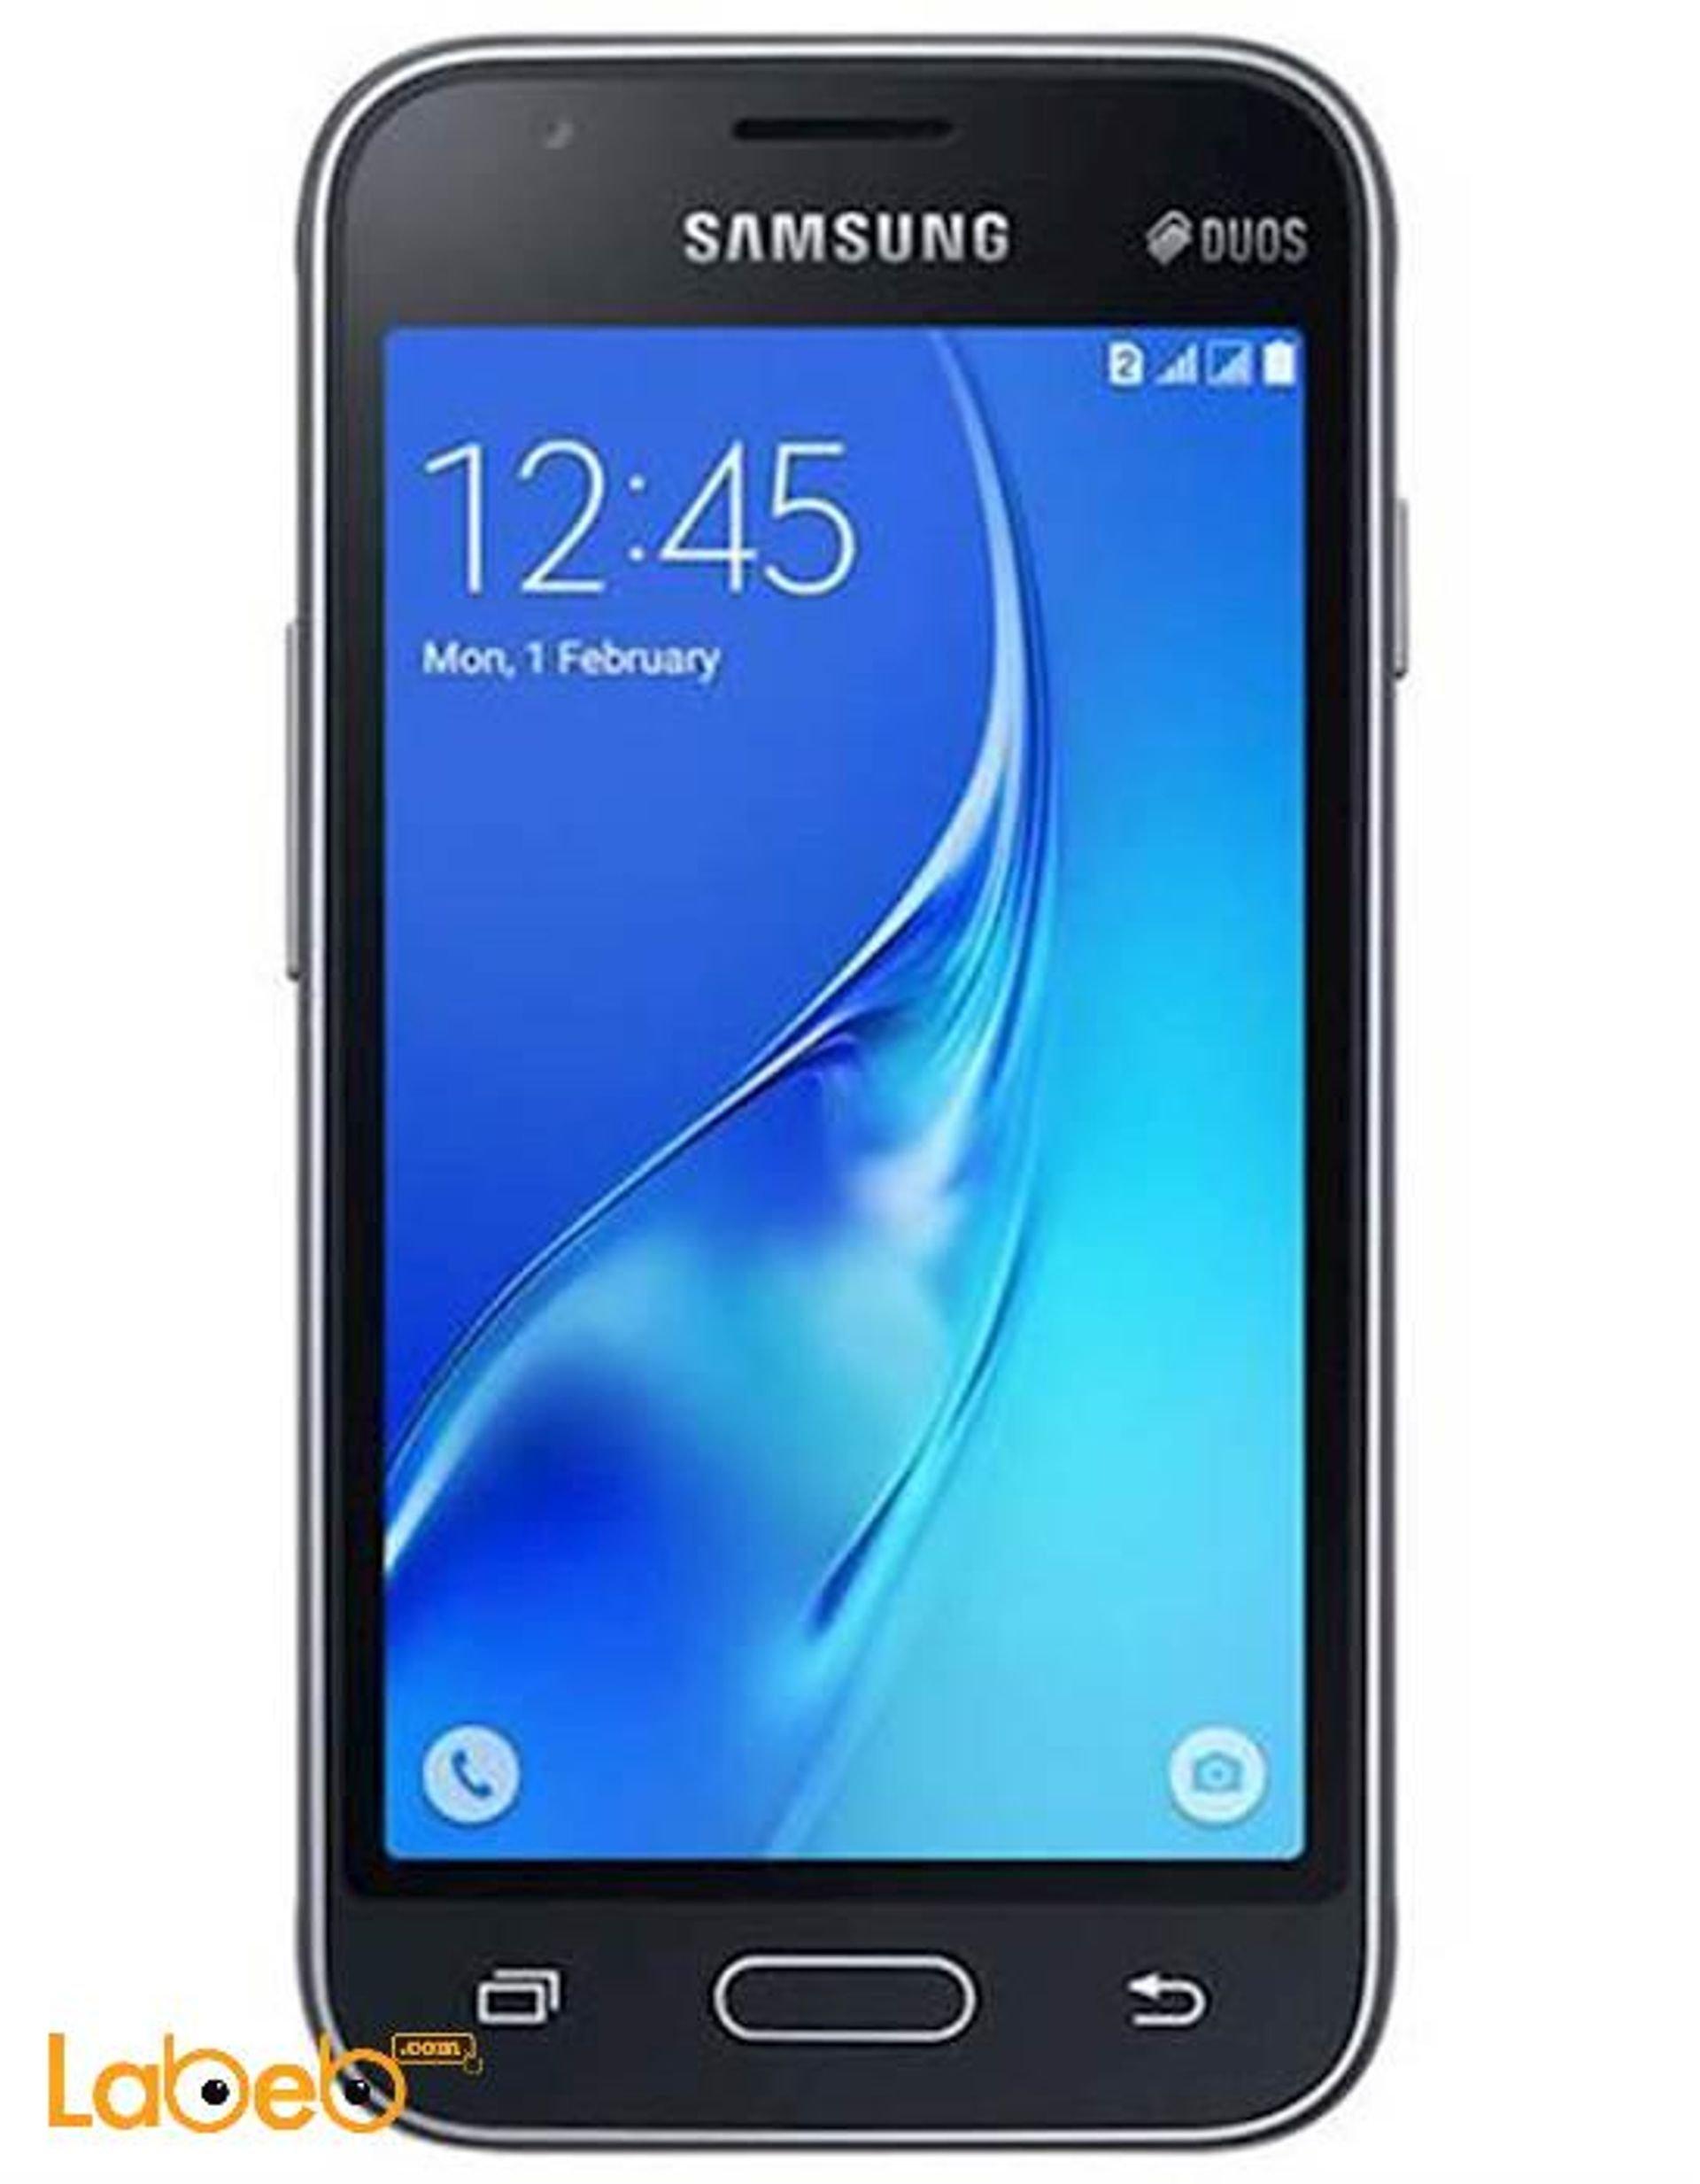 samsung galaxy smartphone - HD975×1787